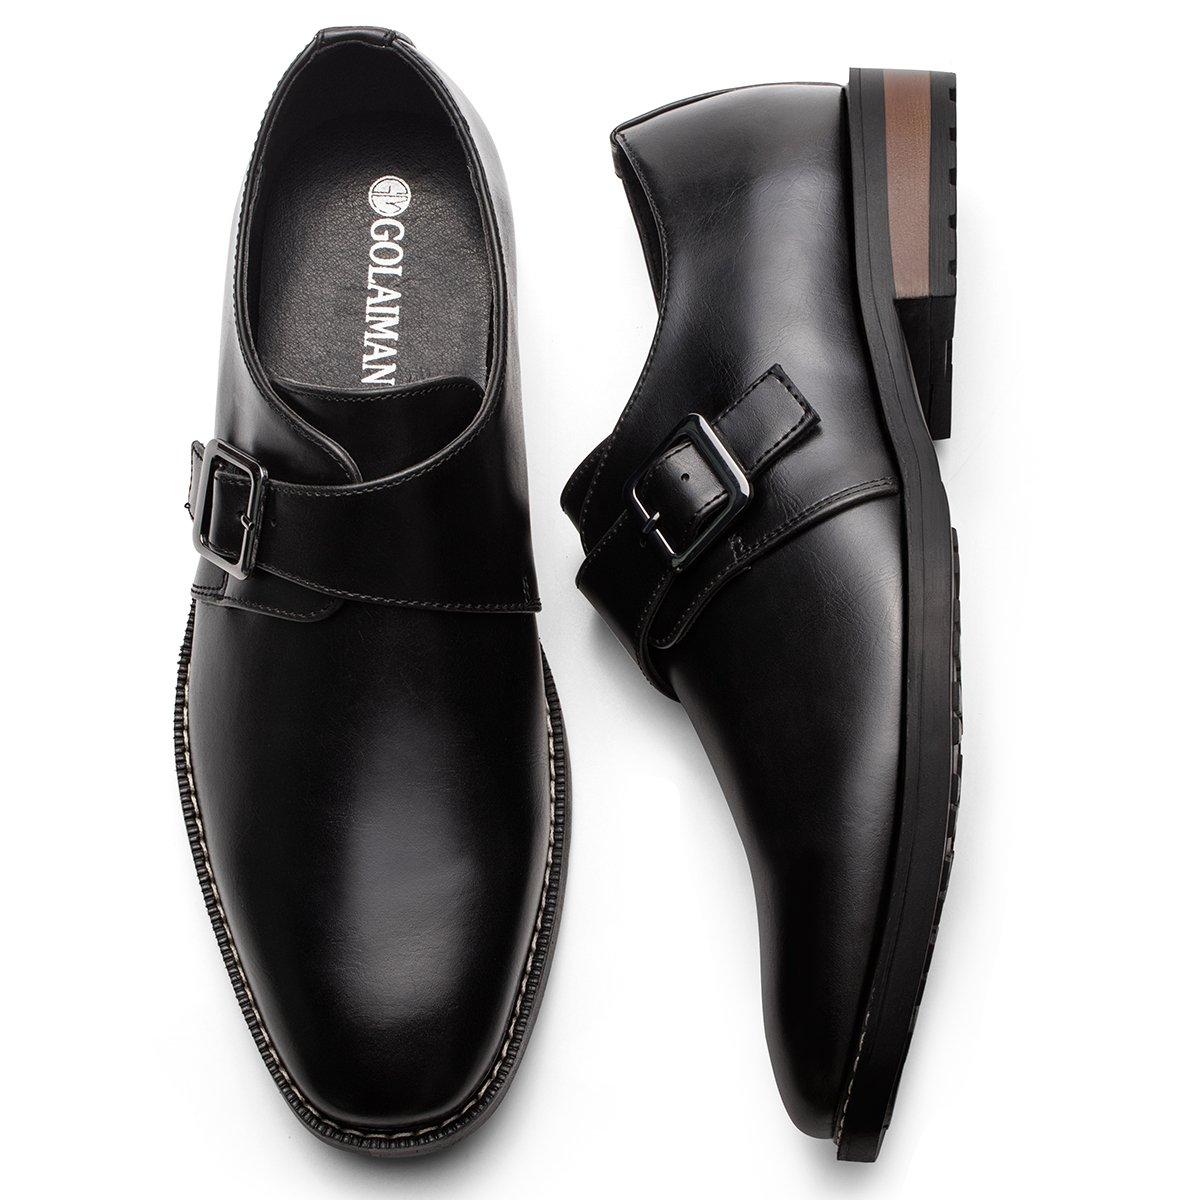 Men's Leather Oxford Dress Shoes Monk Strap Buckle Plain Toe Slip-On Loafer Black 10.5